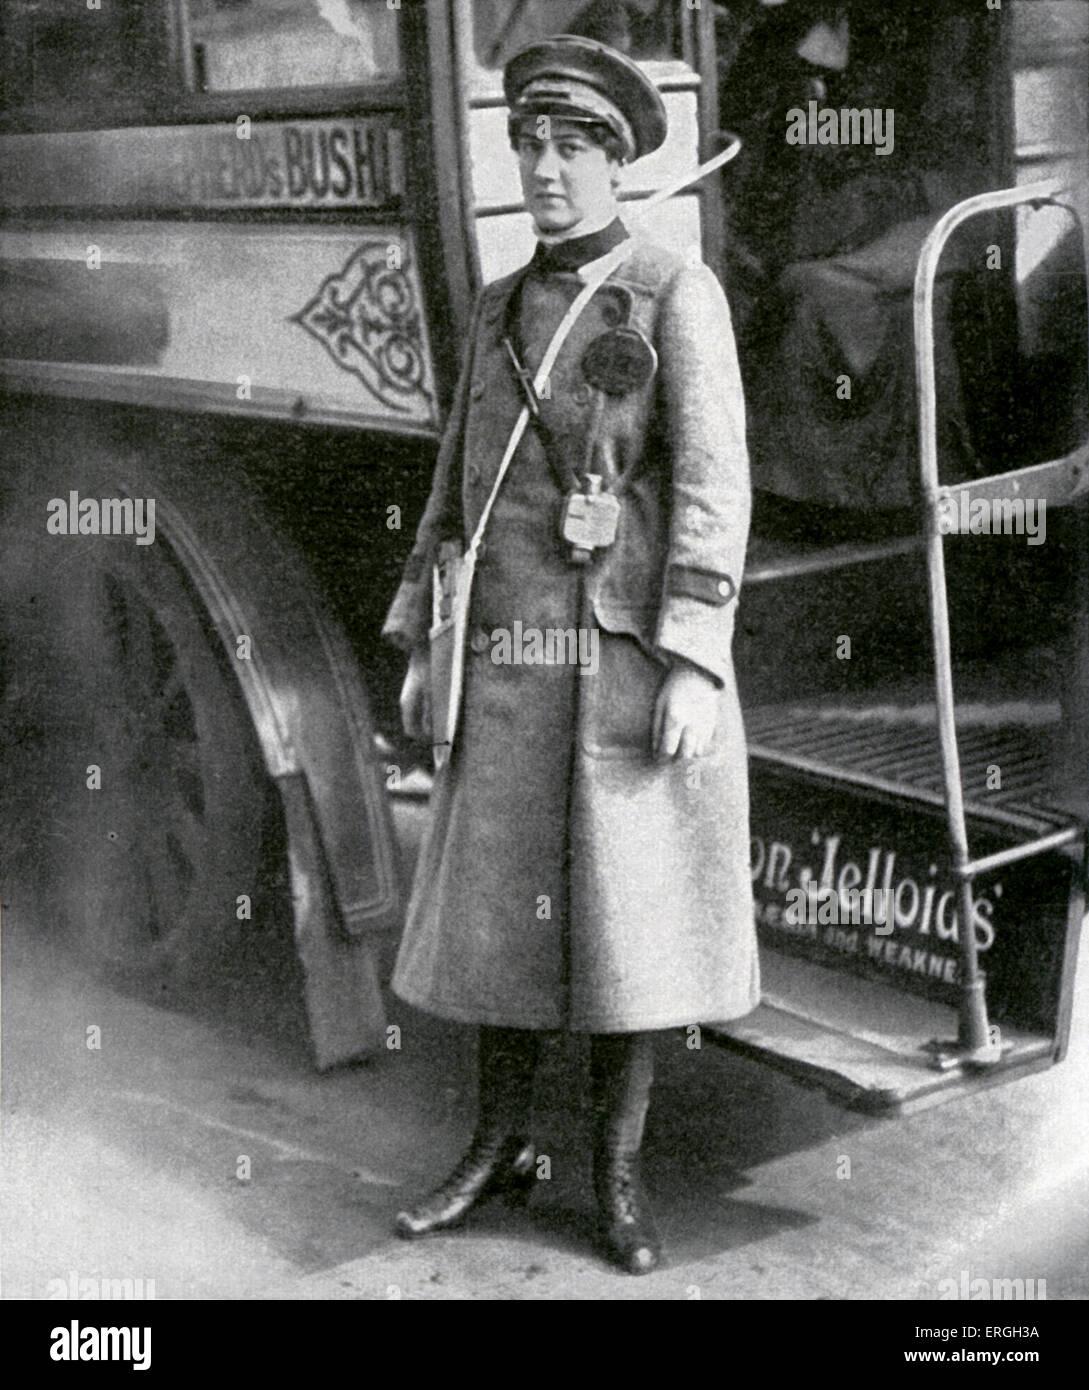 Weibliche Bus Dirigent während Weltkrieges 1, London, UK. April 1916. Stockbild